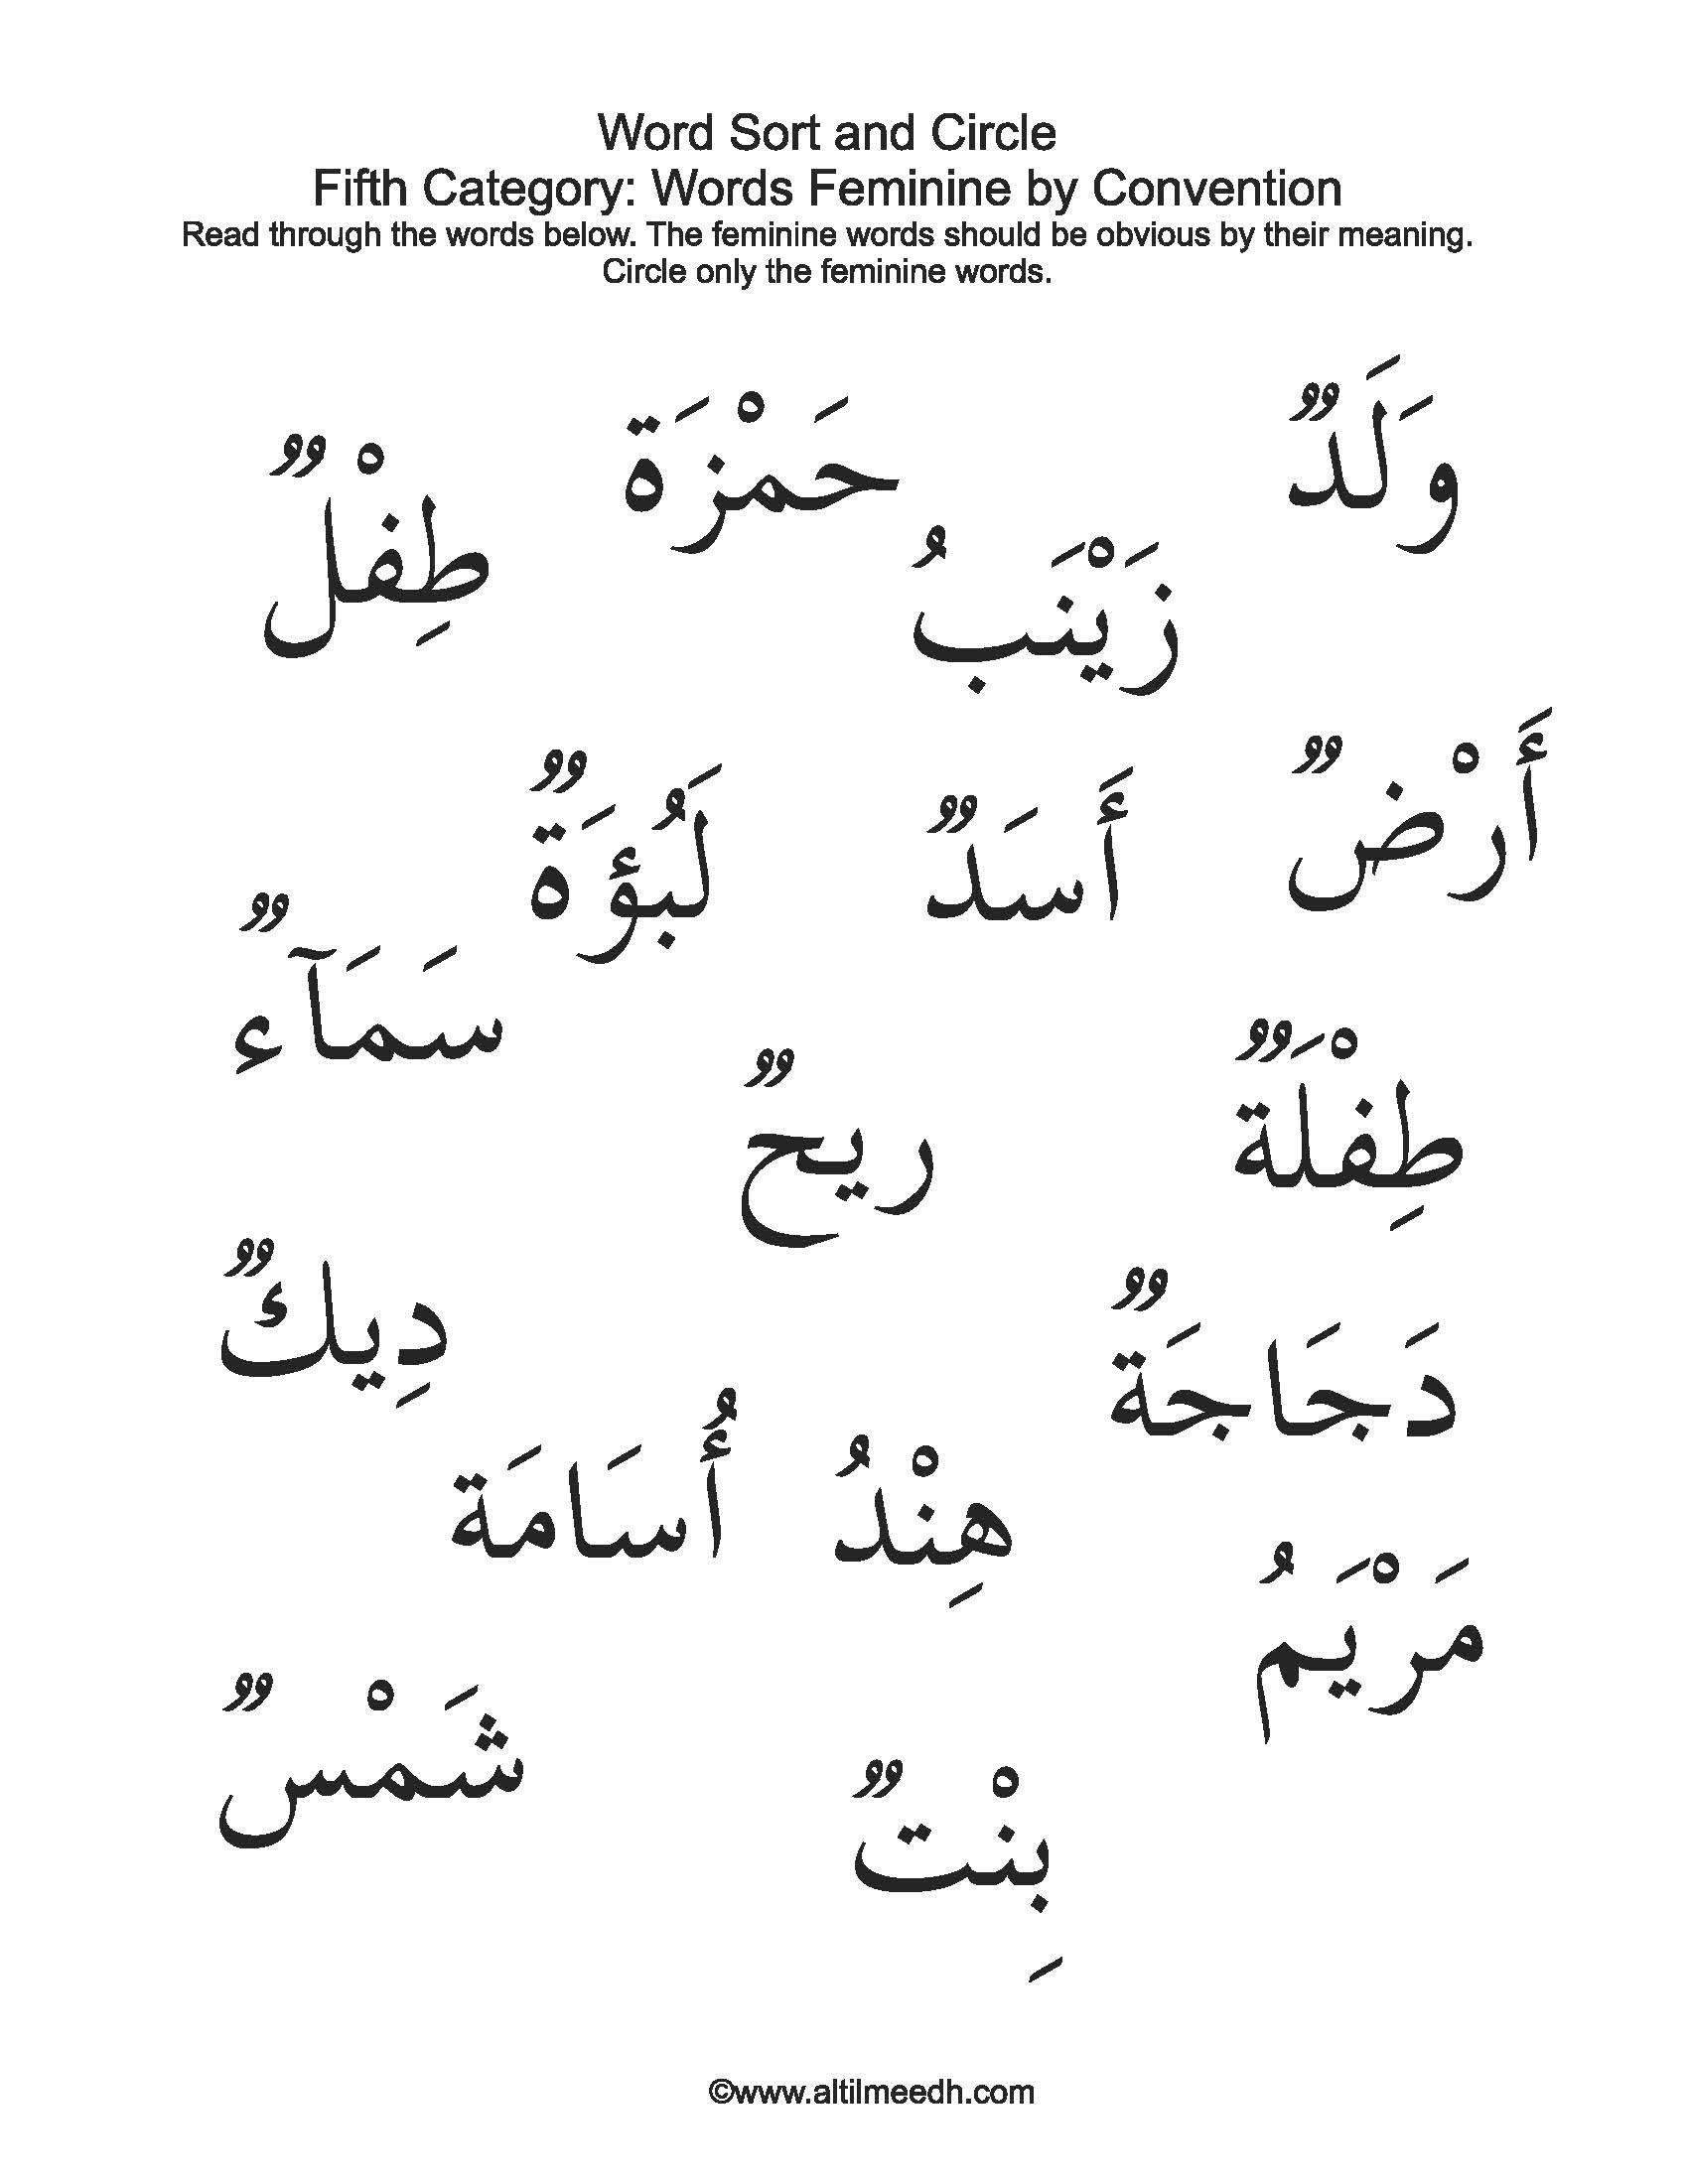 Quran Worksheets For Kids  Gambar Islami With Quran Worksheets For Beginners